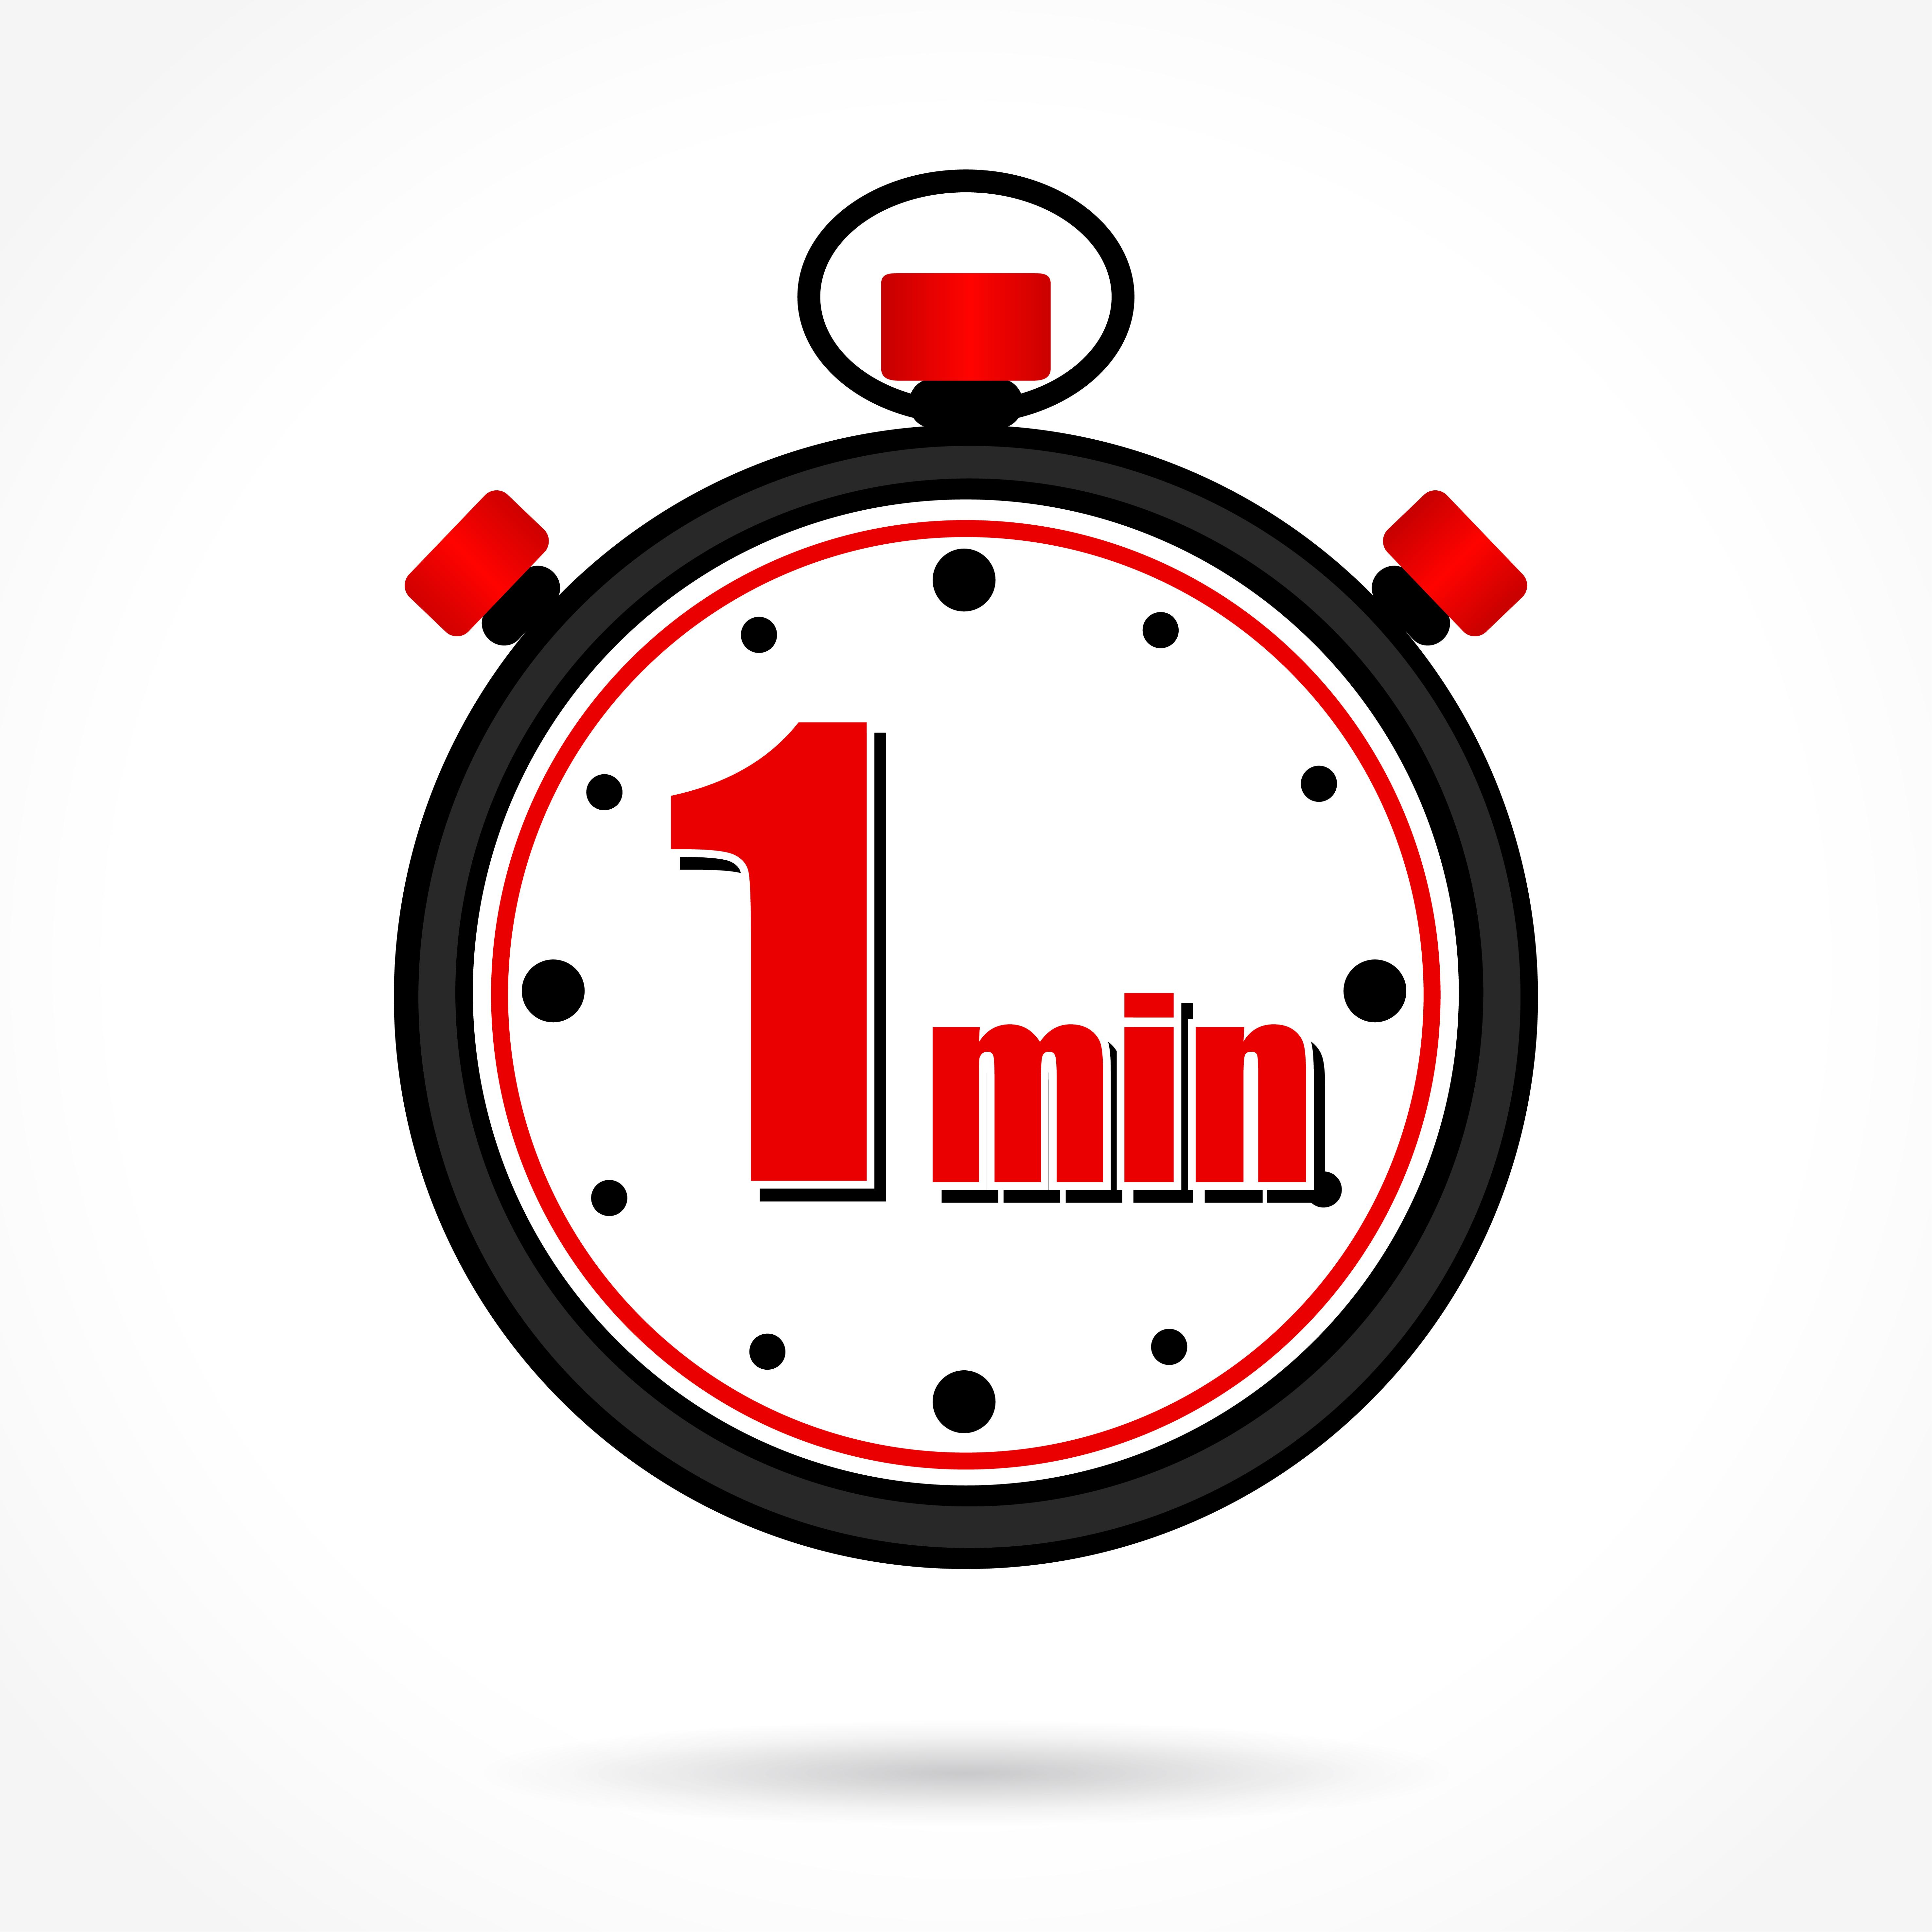 Ur viser 1 minut